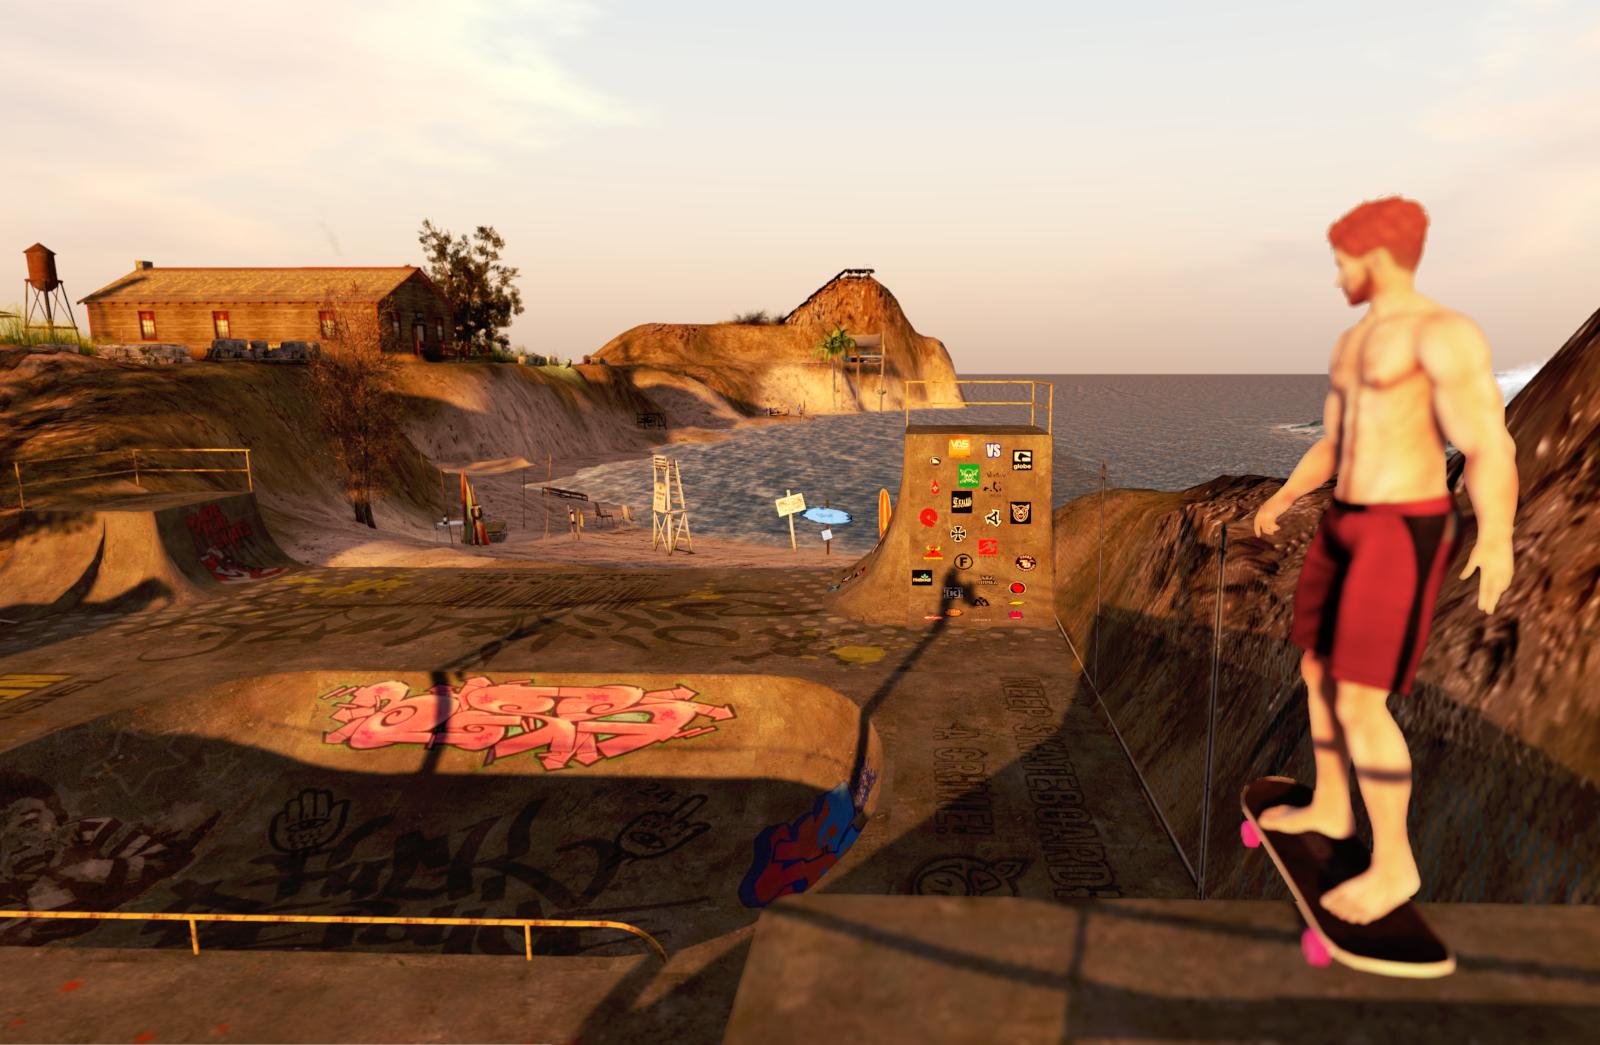 Ricco at the skateboarding area